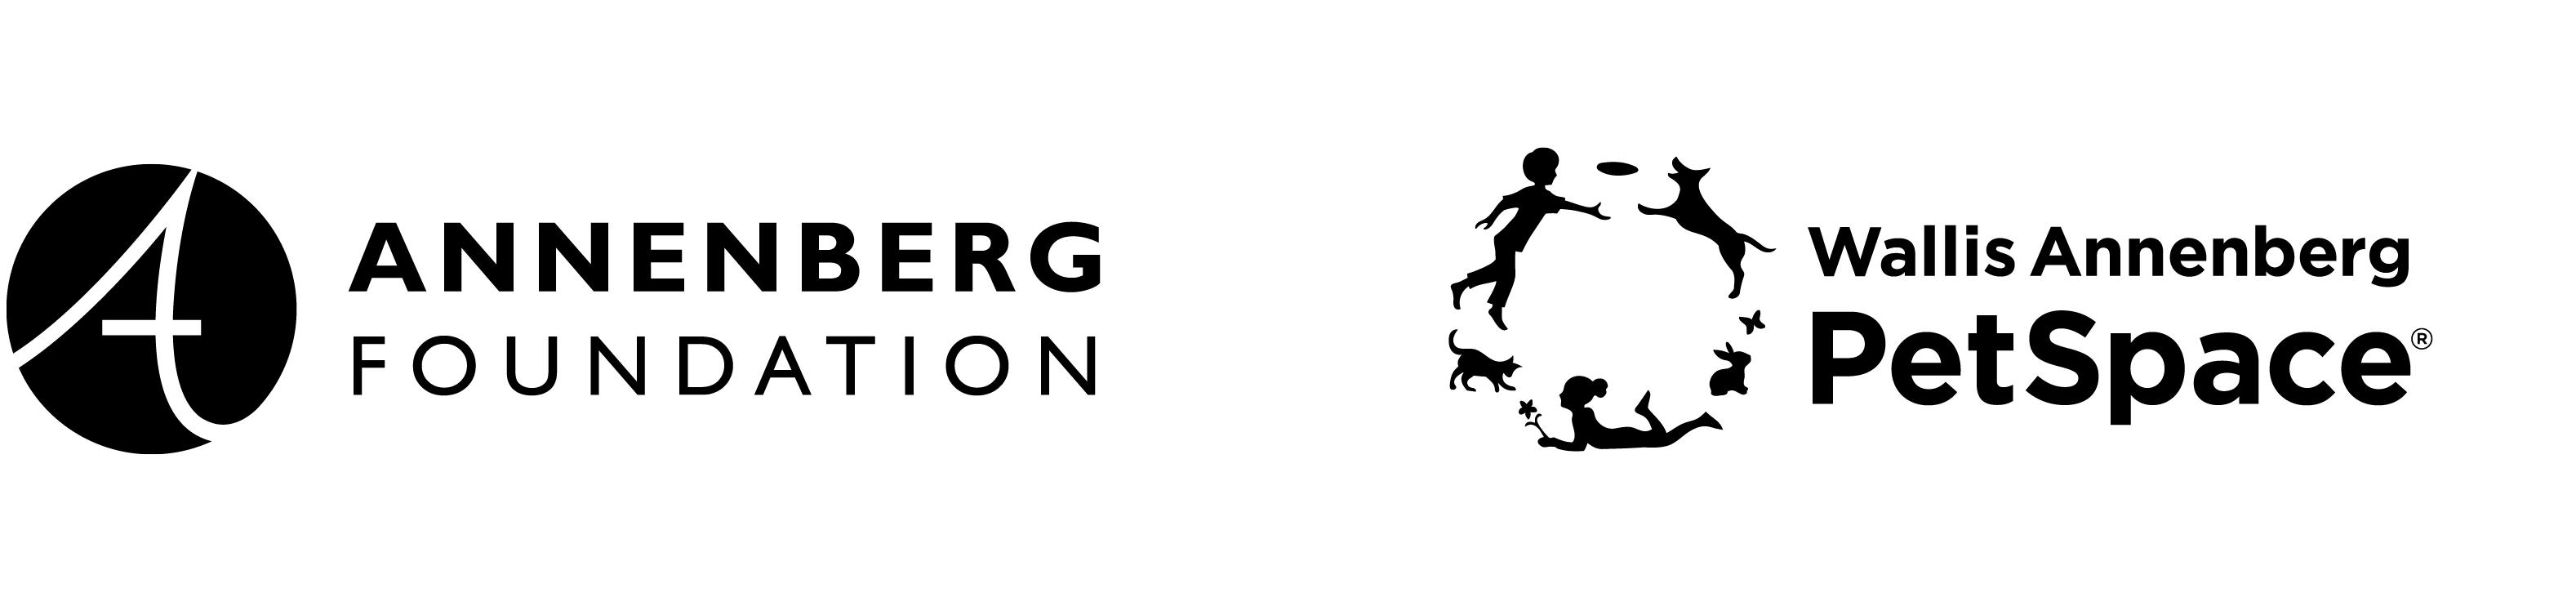 Annenberg Foundation + PetSpace logo